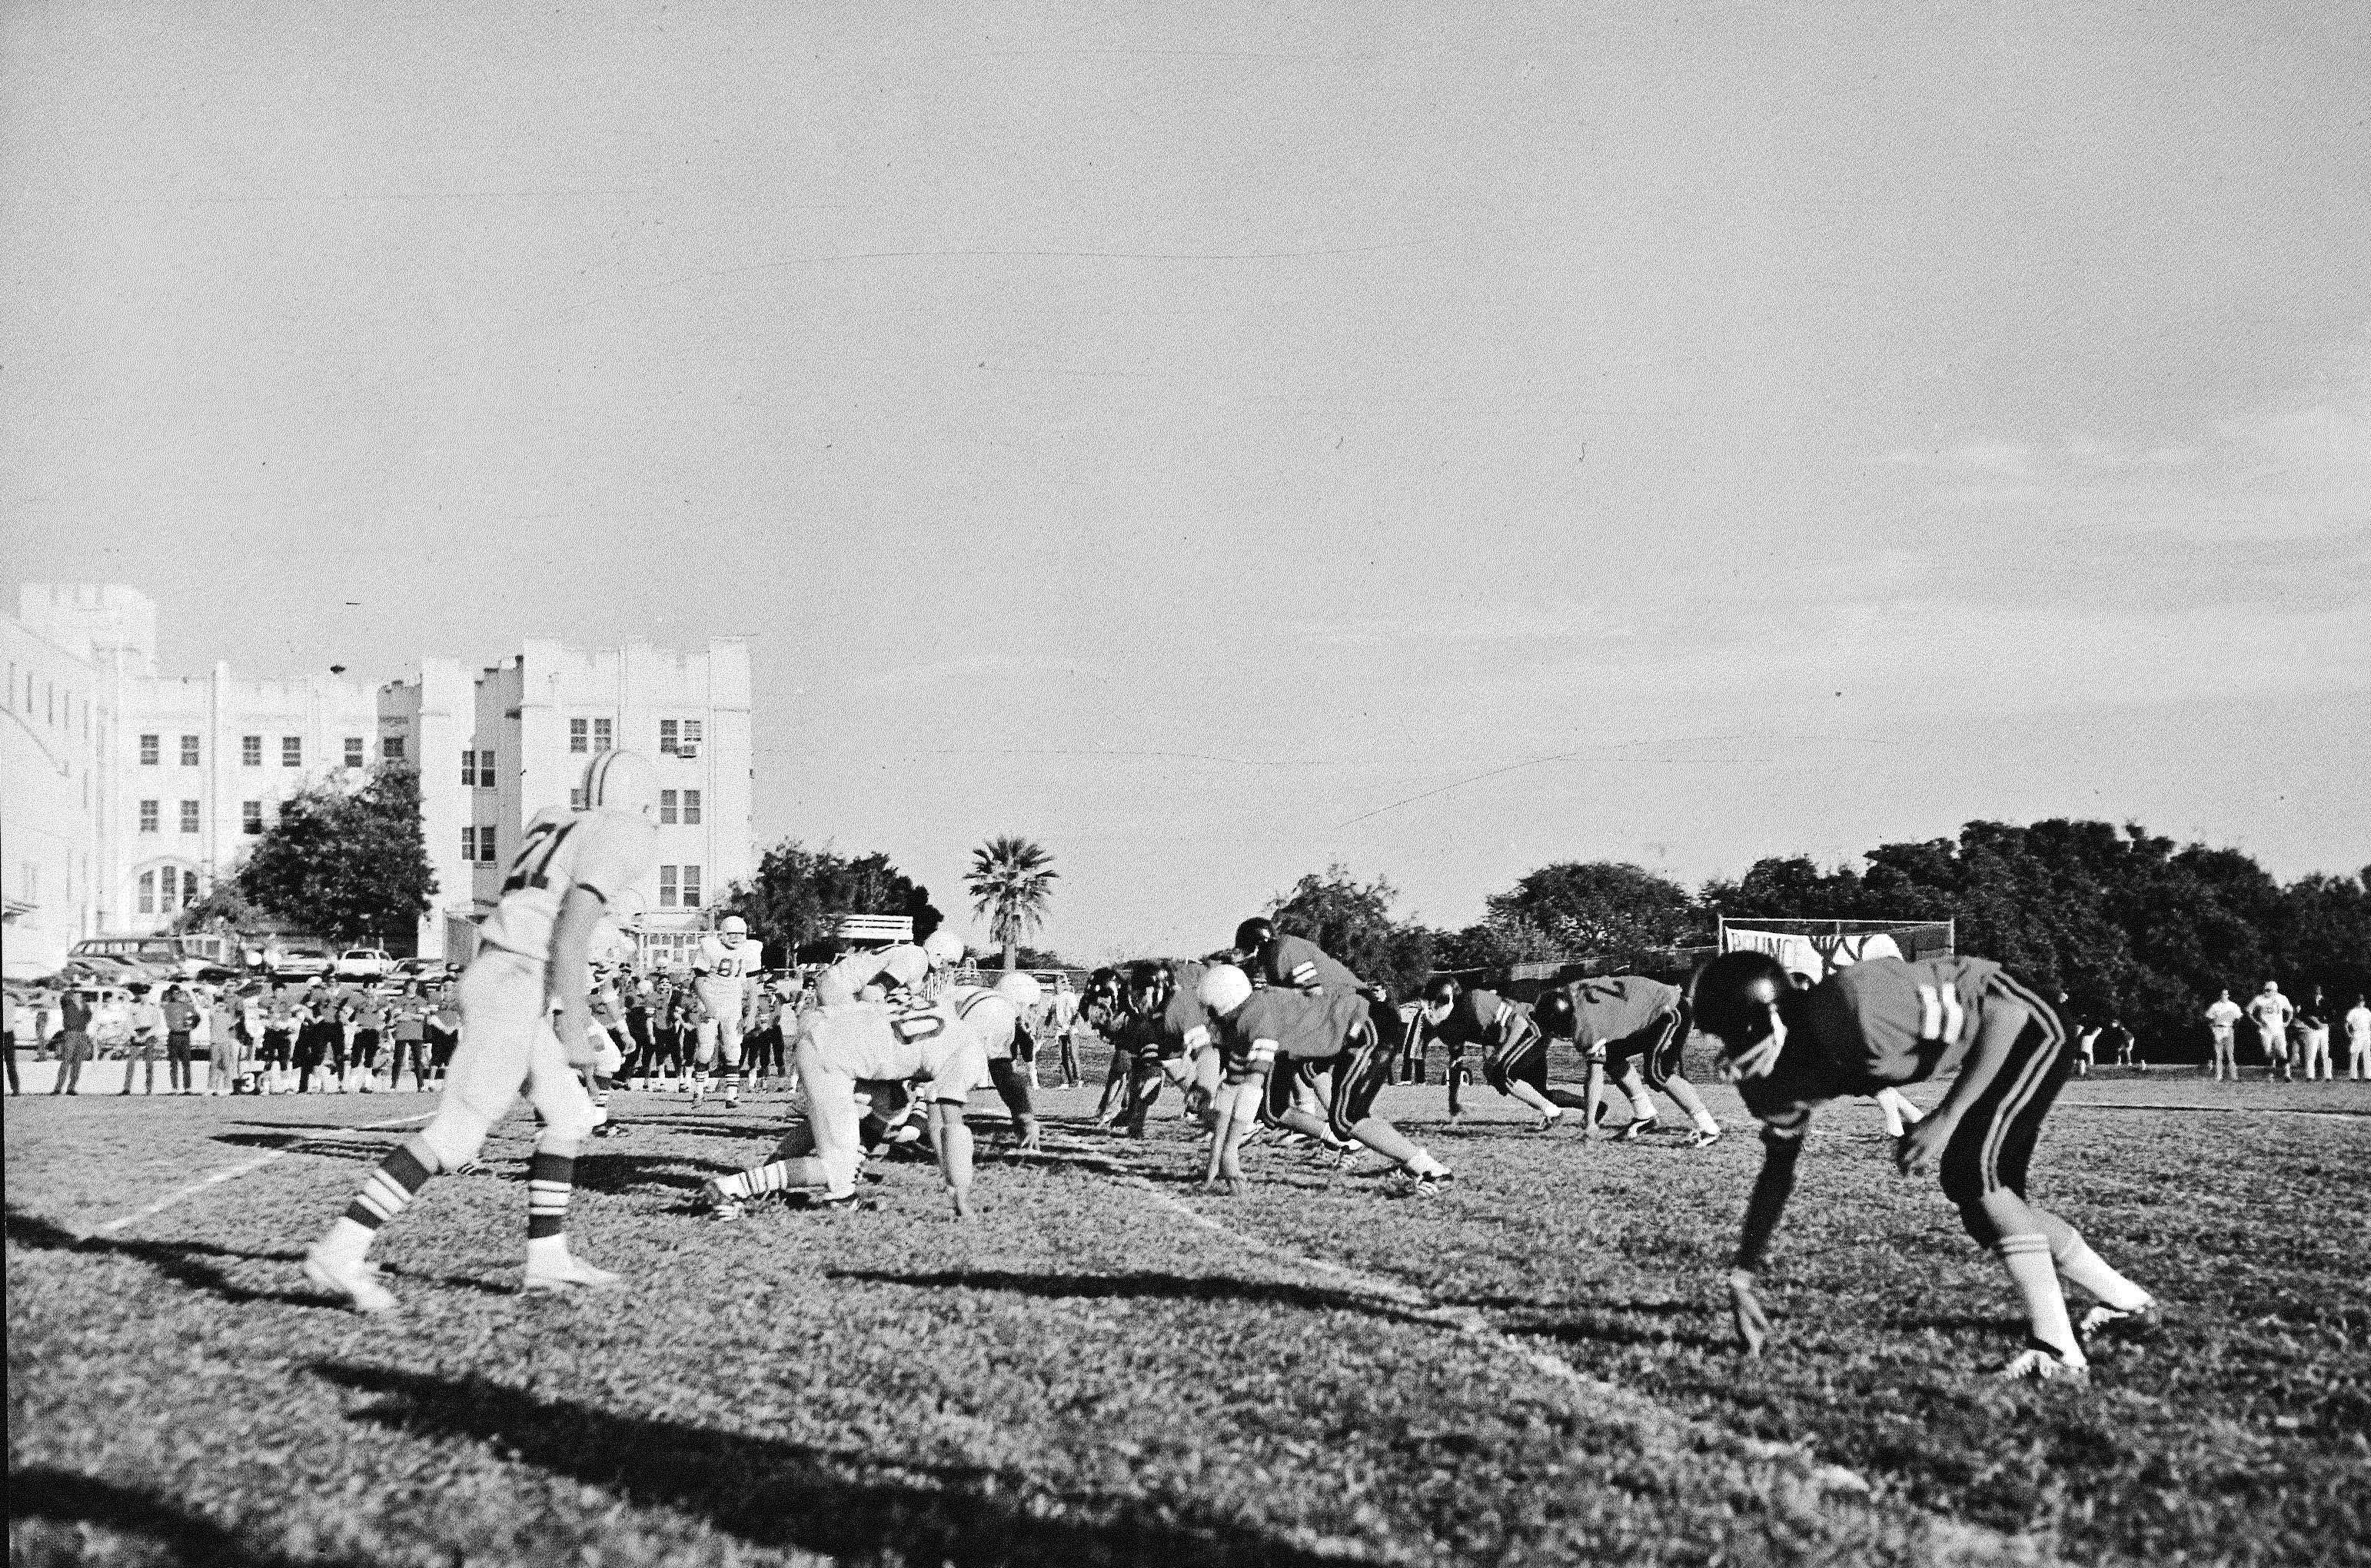 1970s football photo.jpg